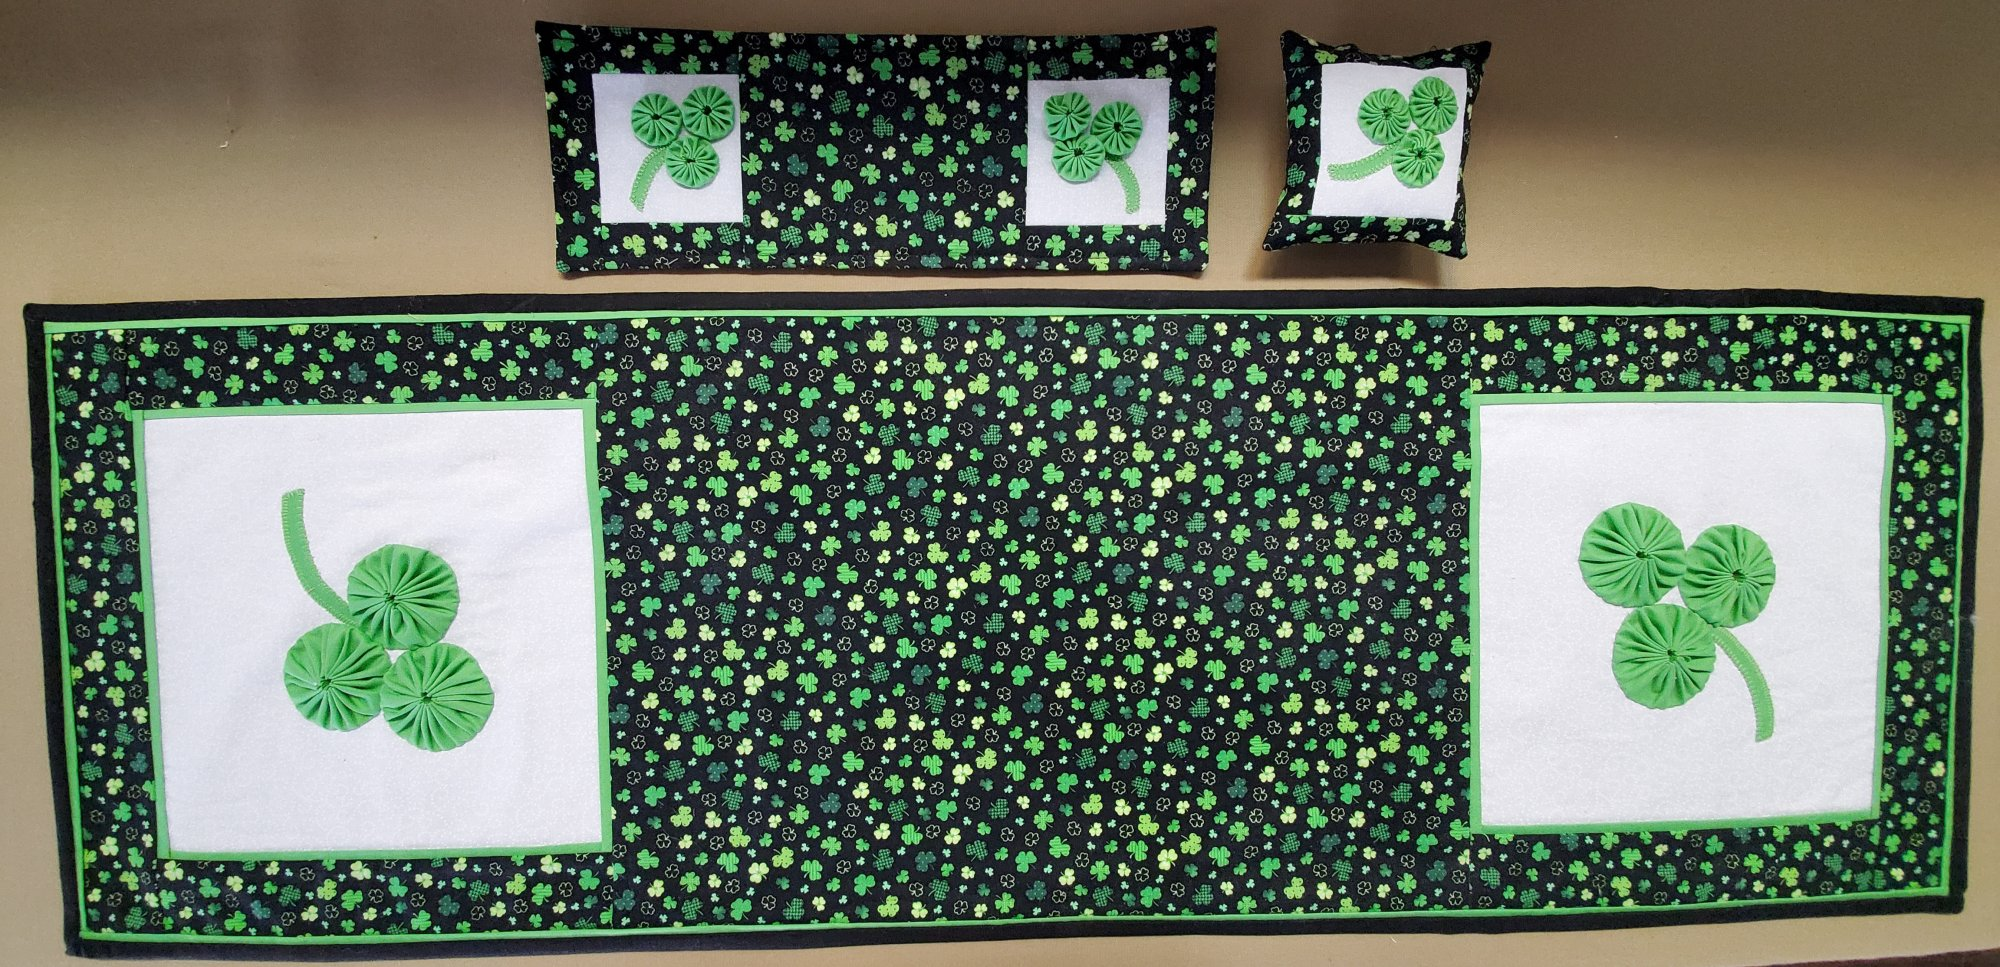 St. Patty's Day Runner Fabric Kit 14x43 + Bonus Projects